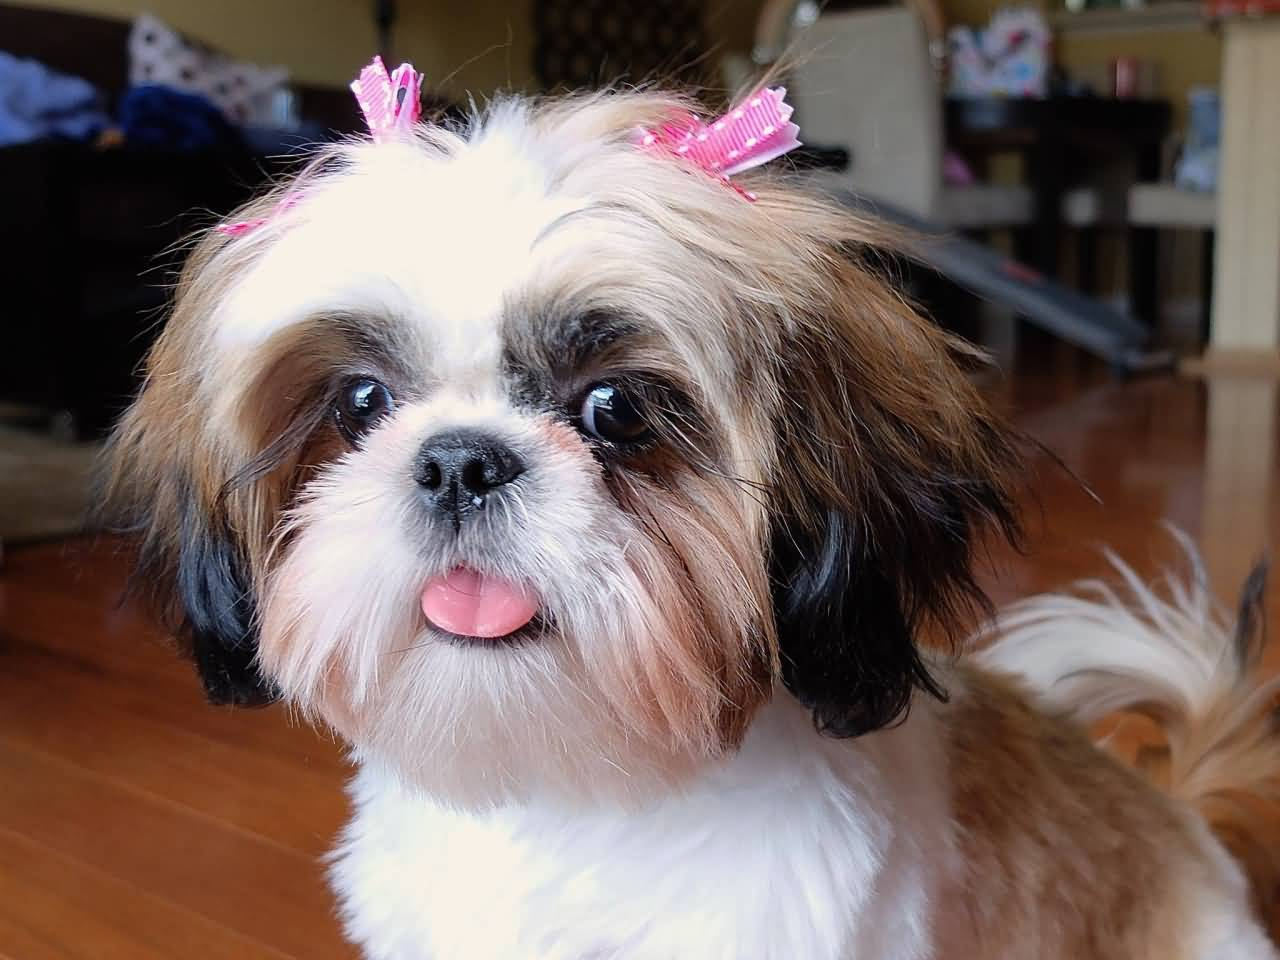 Cute St Patricks Day Wallpaper Very Nice Female Shih Tzu Dog In Home Picsmine